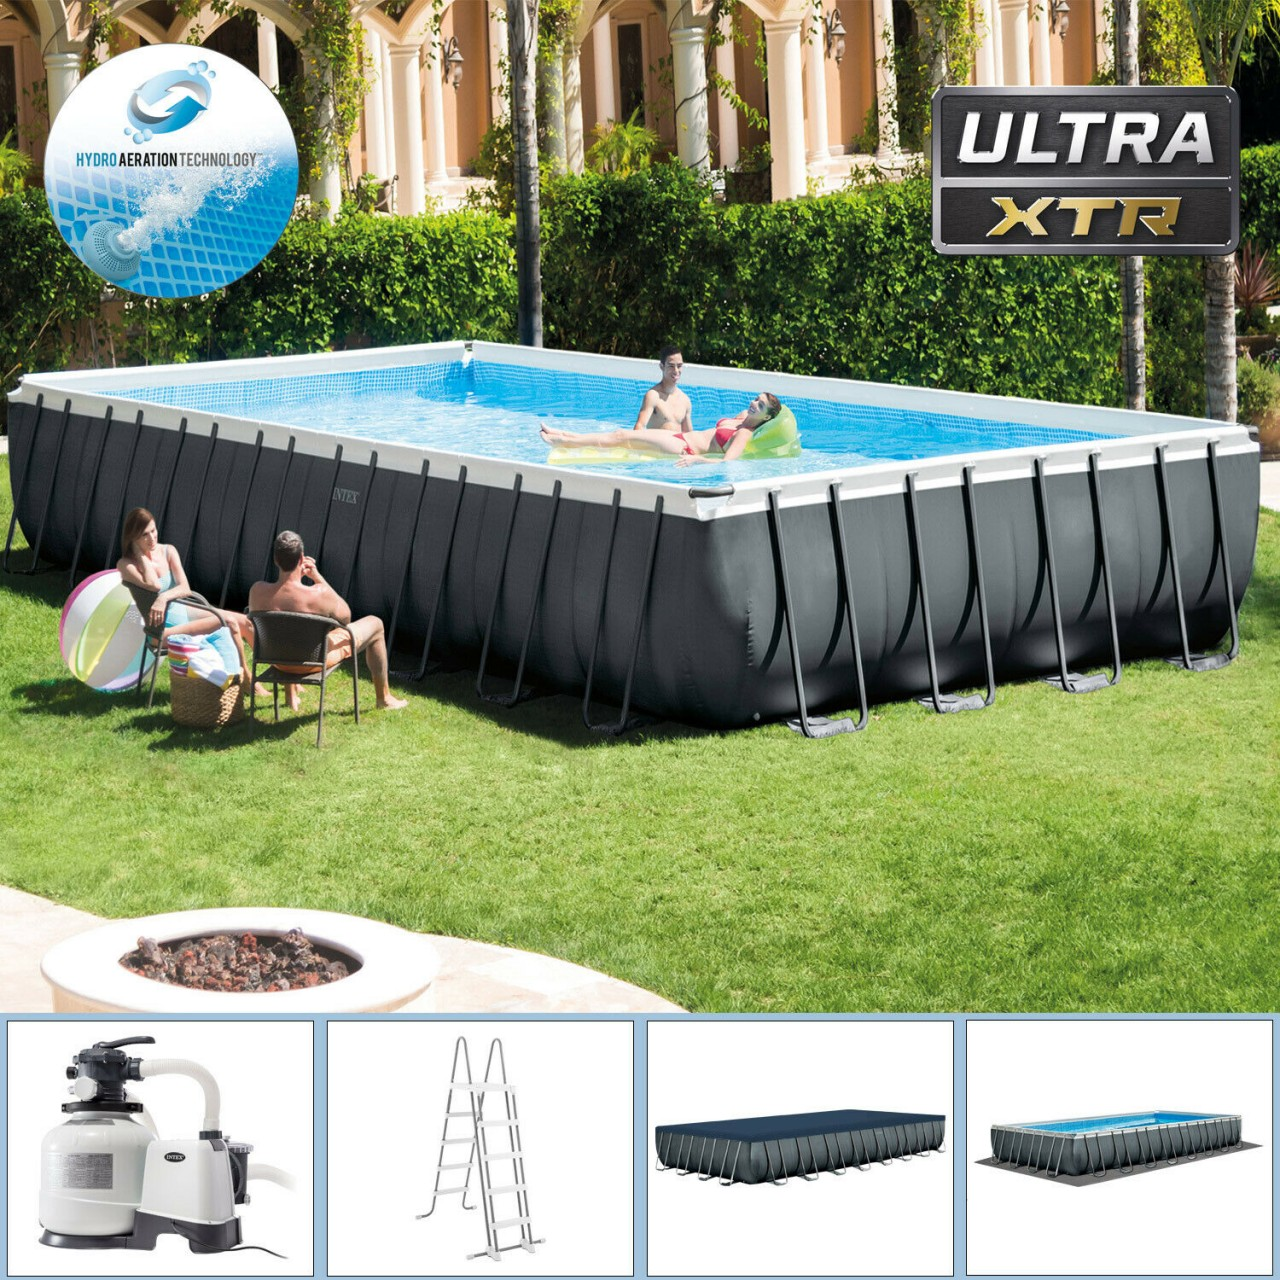 Intex Swimmingpool XTR Ultra Frame Pool Set 975 x 488 x 132 cm 26374